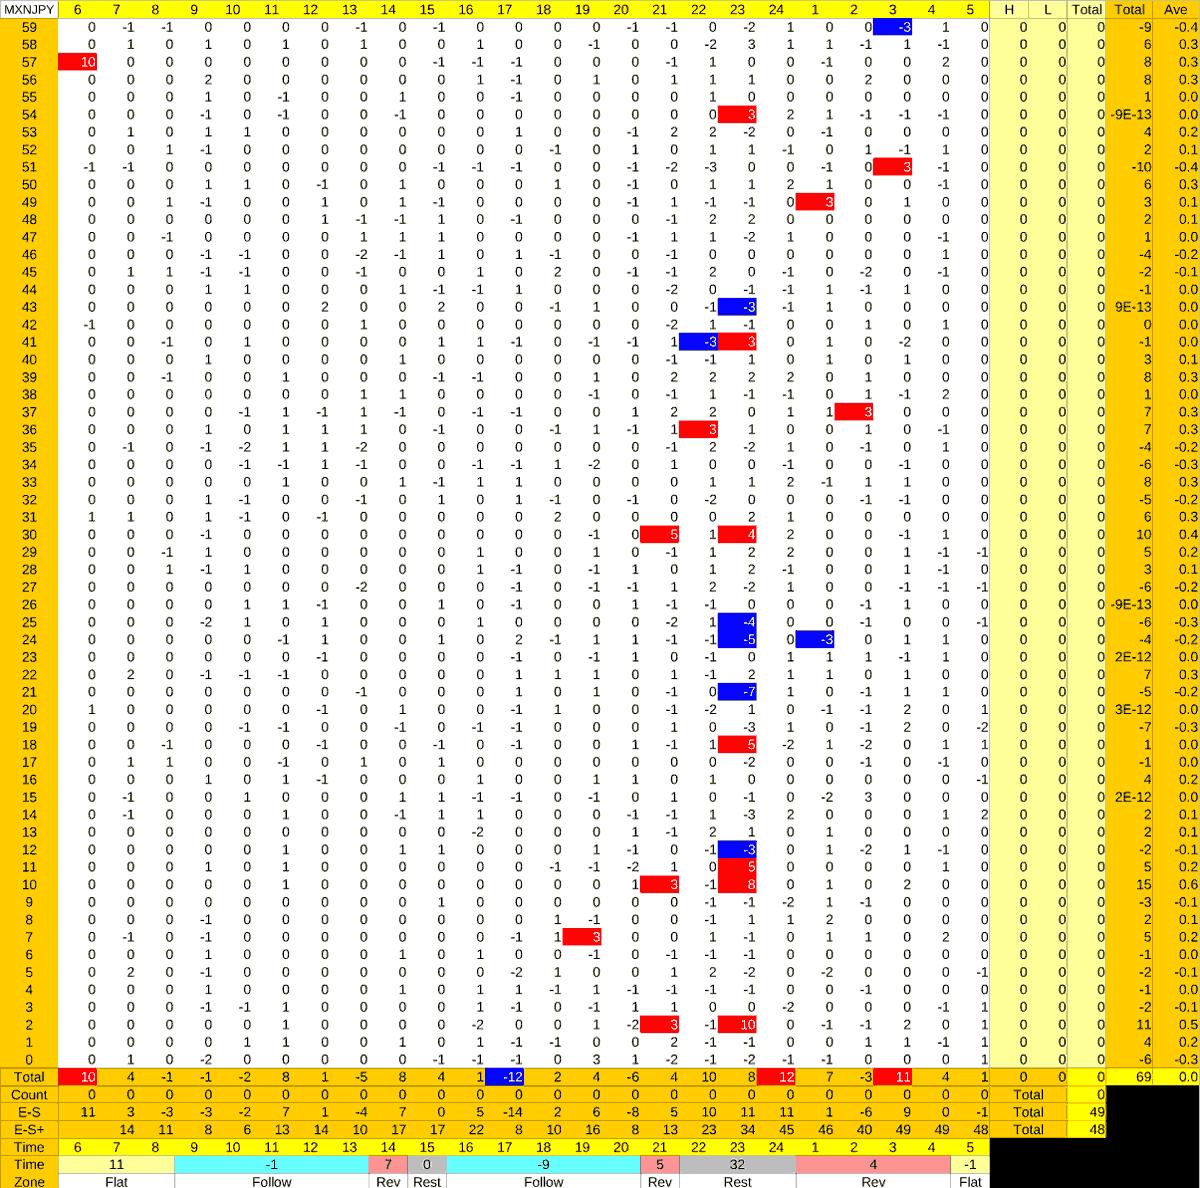 20210827_HS(3)MXNJPY